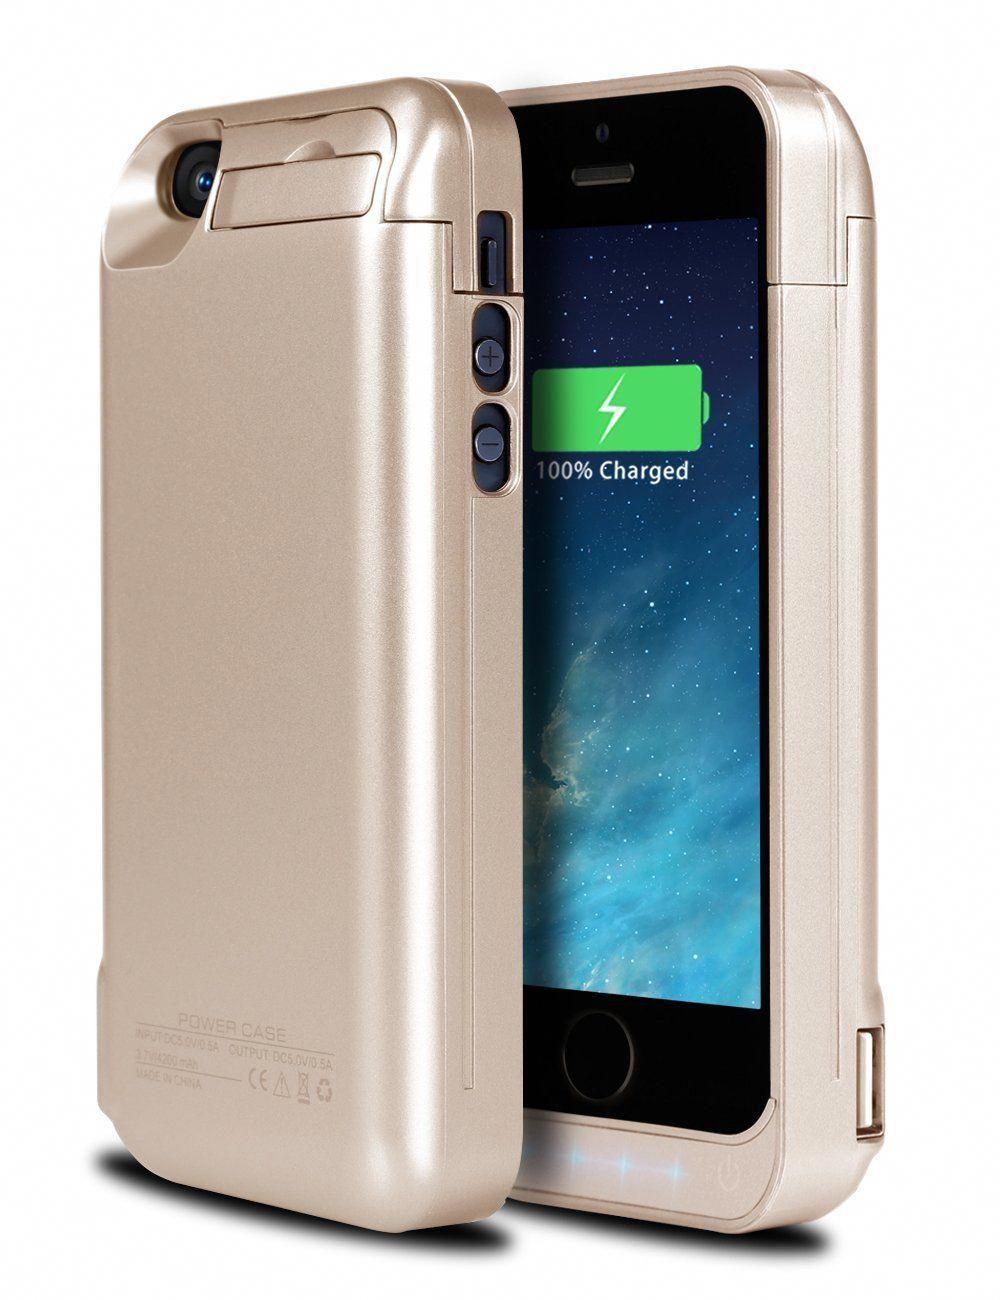 new arrival 85445 53645 Amazon.com: iPhone 5S Battery Case, Ecpow 4200mAh Rechargeable ...